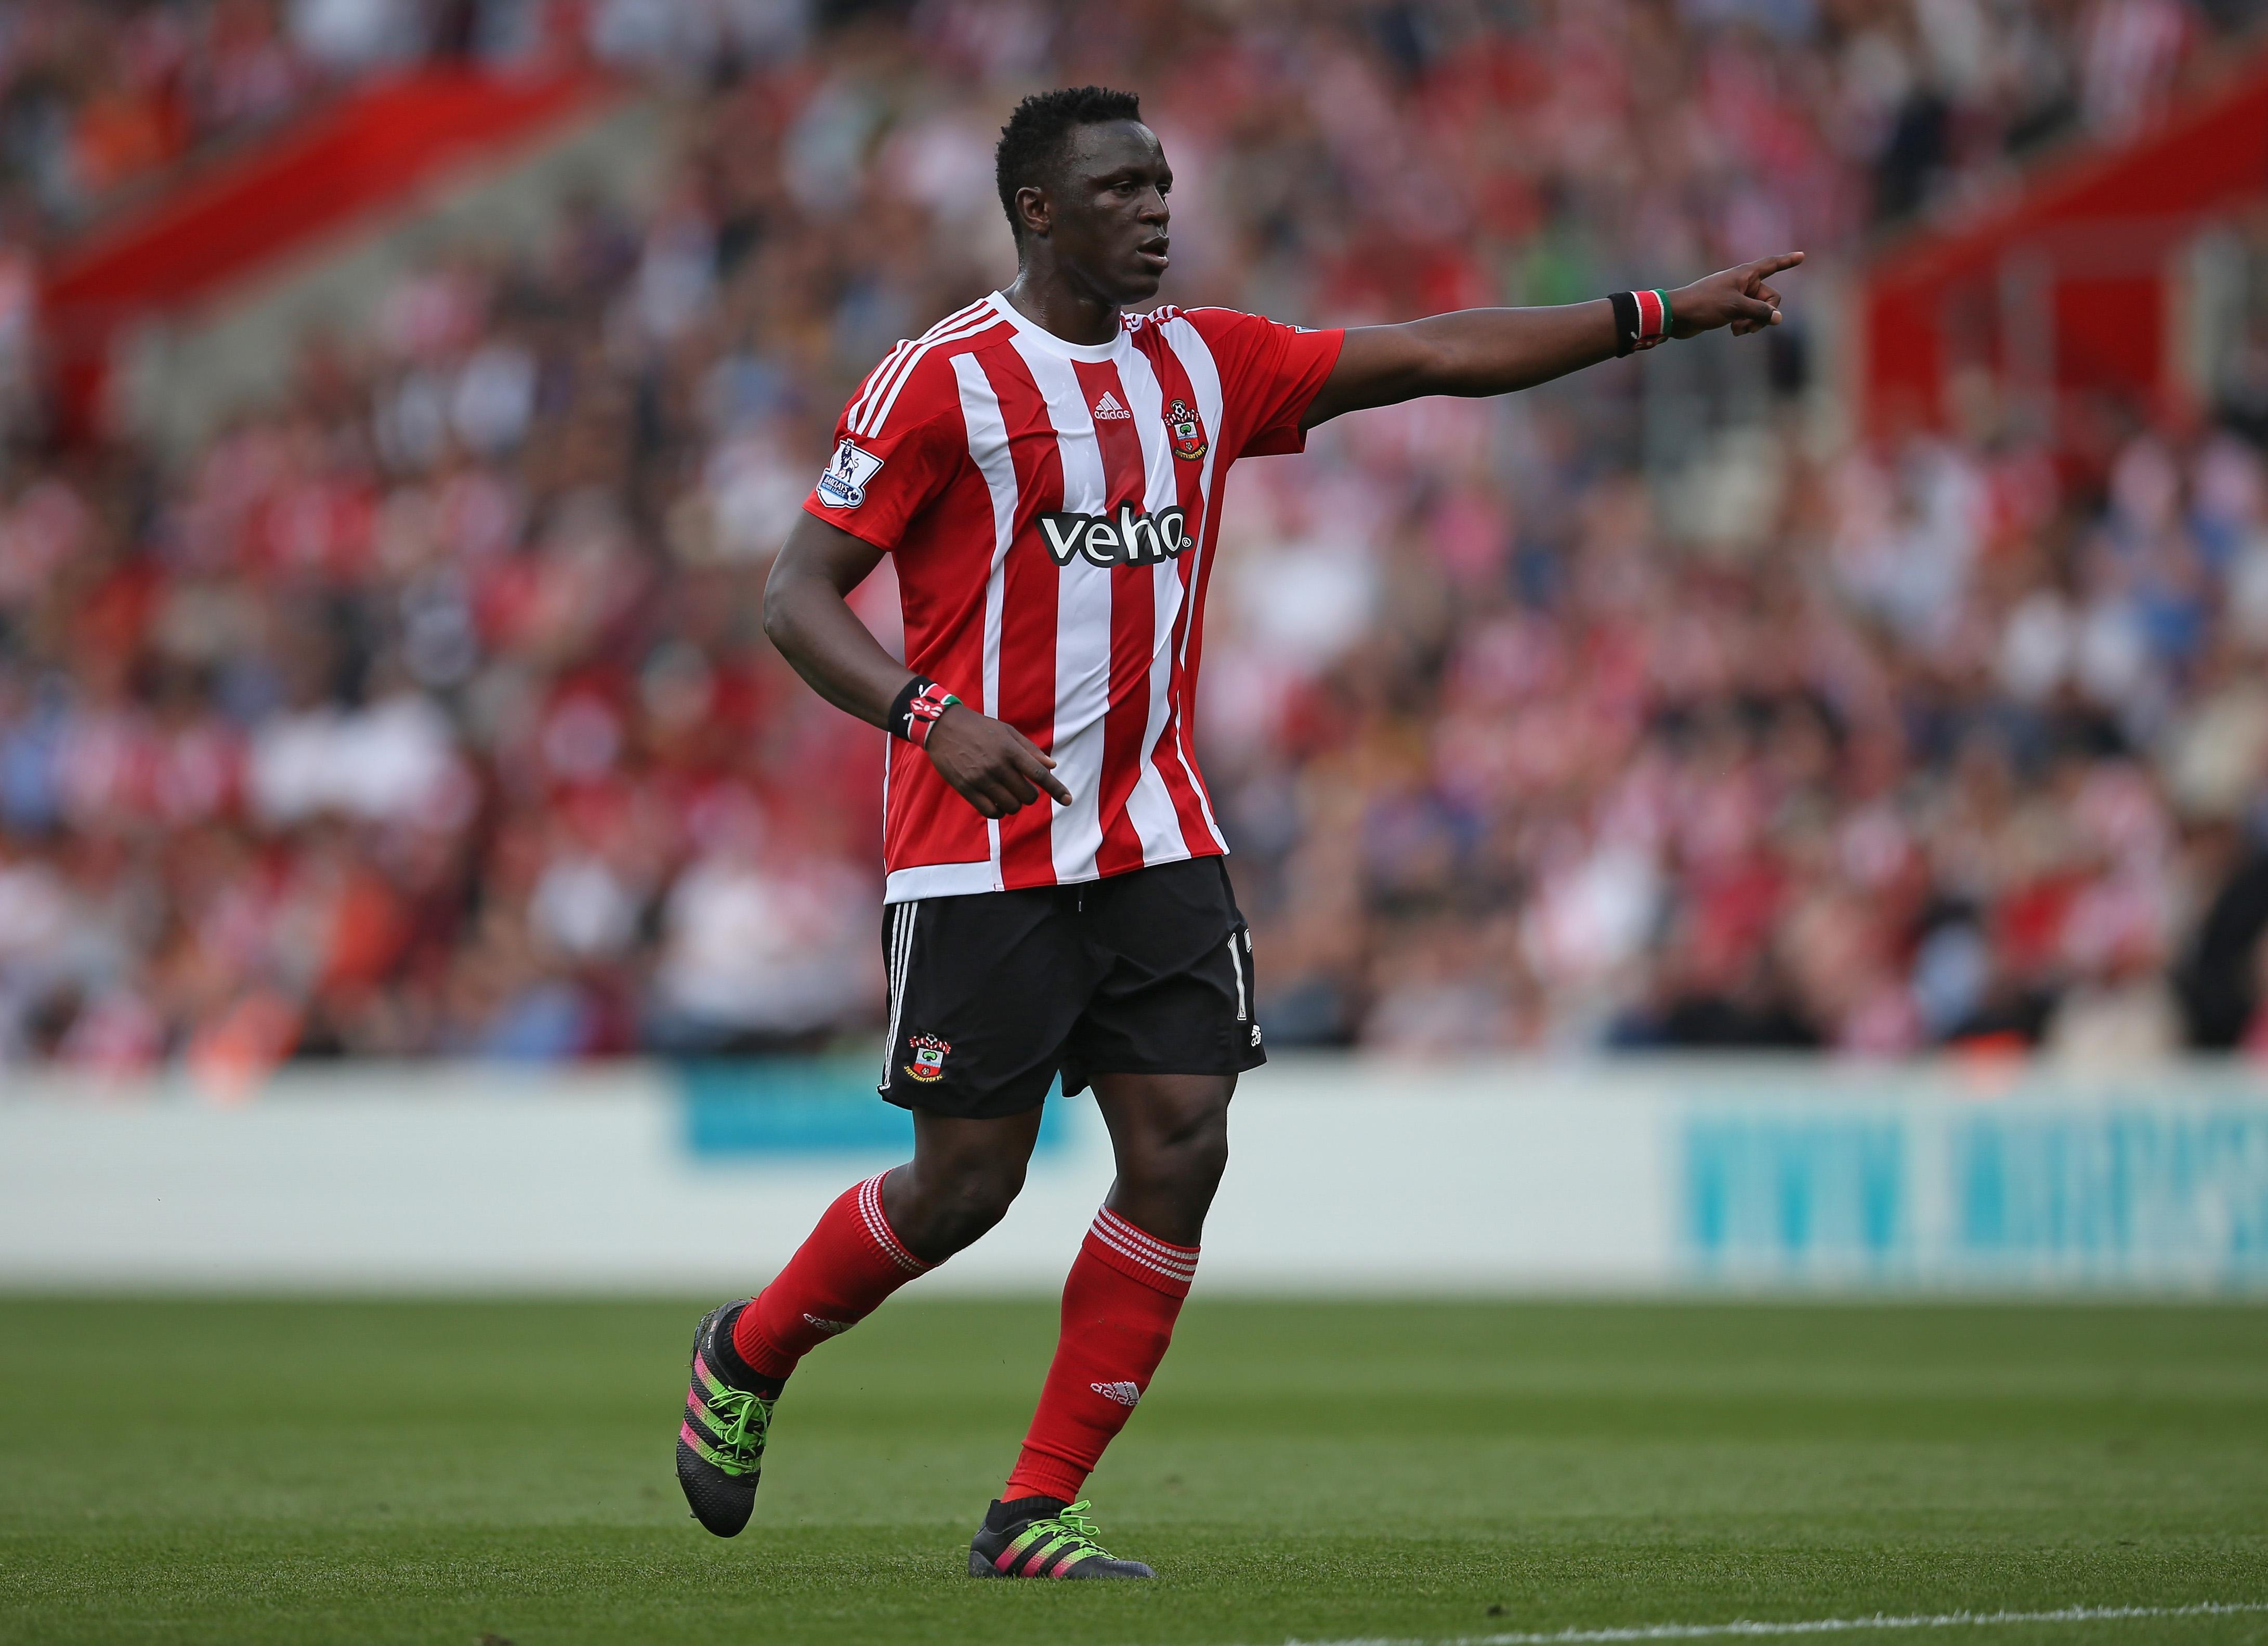 Tottenham to hold talks to seal Victor Wanyama transfer this week